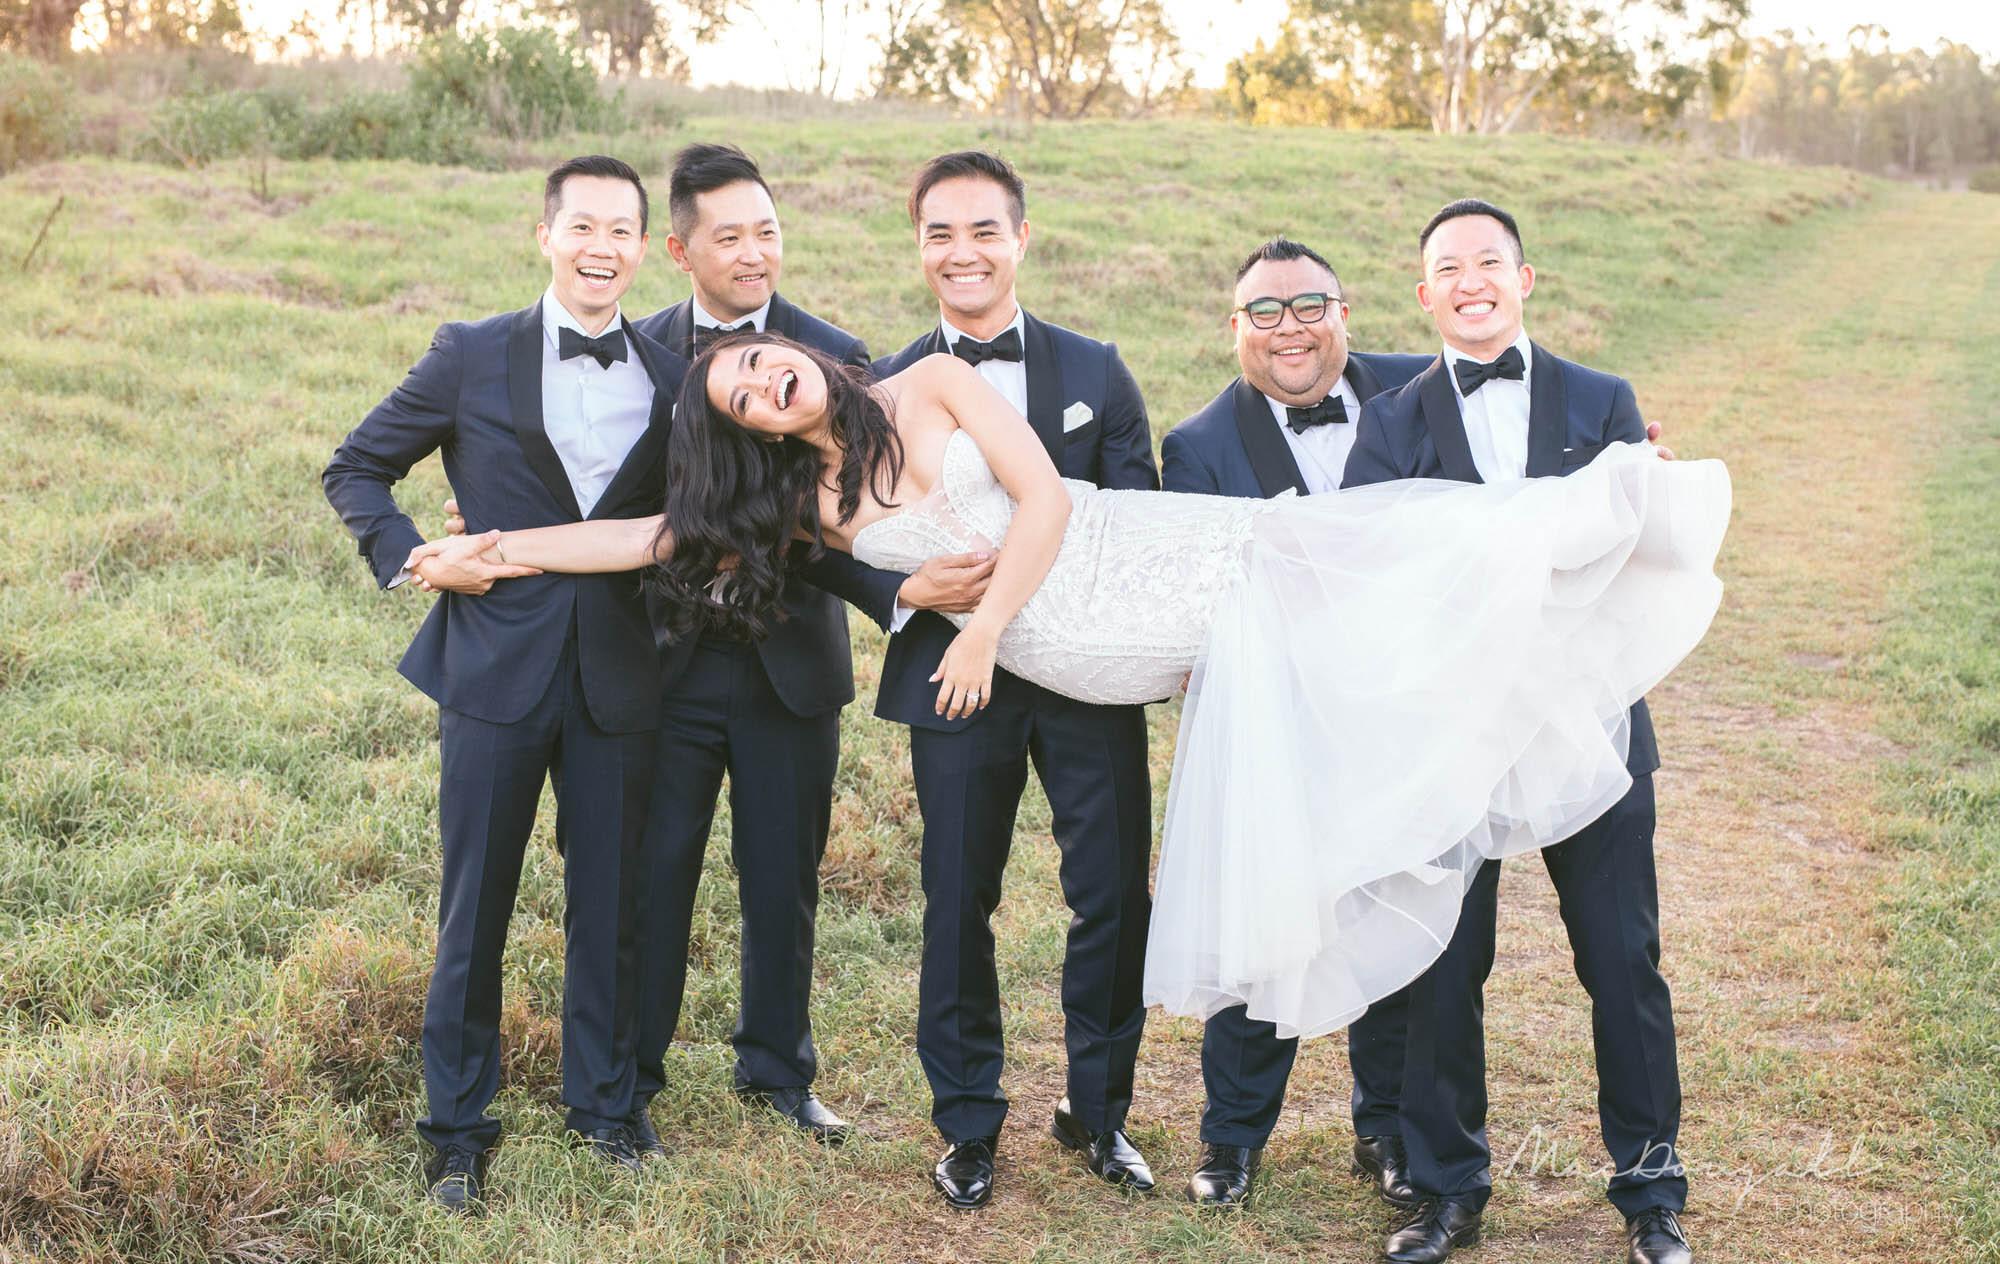 MacDougall-Photography-Sydney-Wedding-Photographers-16.jpg